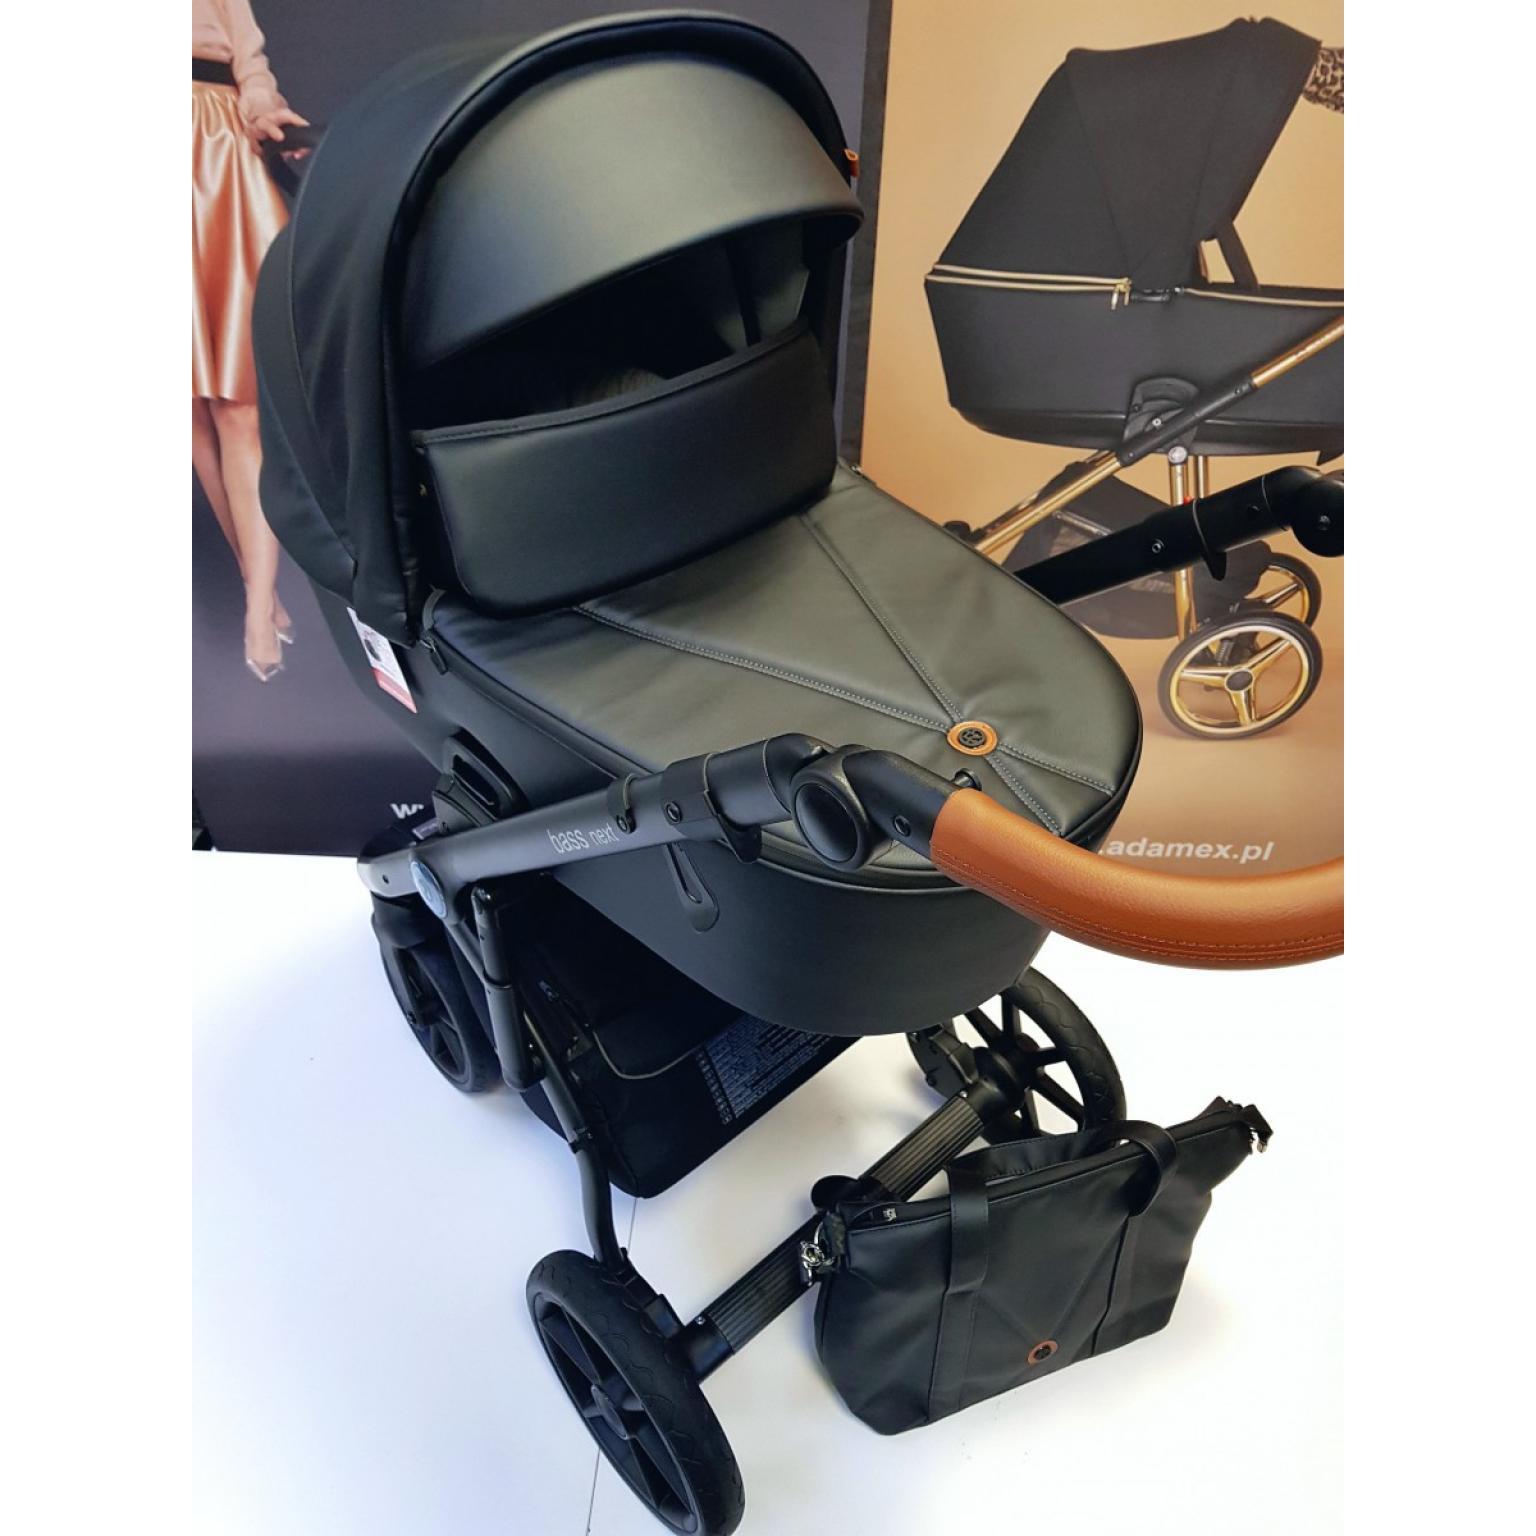 Bērnu-rati-ROAN-BASS-NEXT-ECO-ĀDA-black-детская-коляска-Roan-22